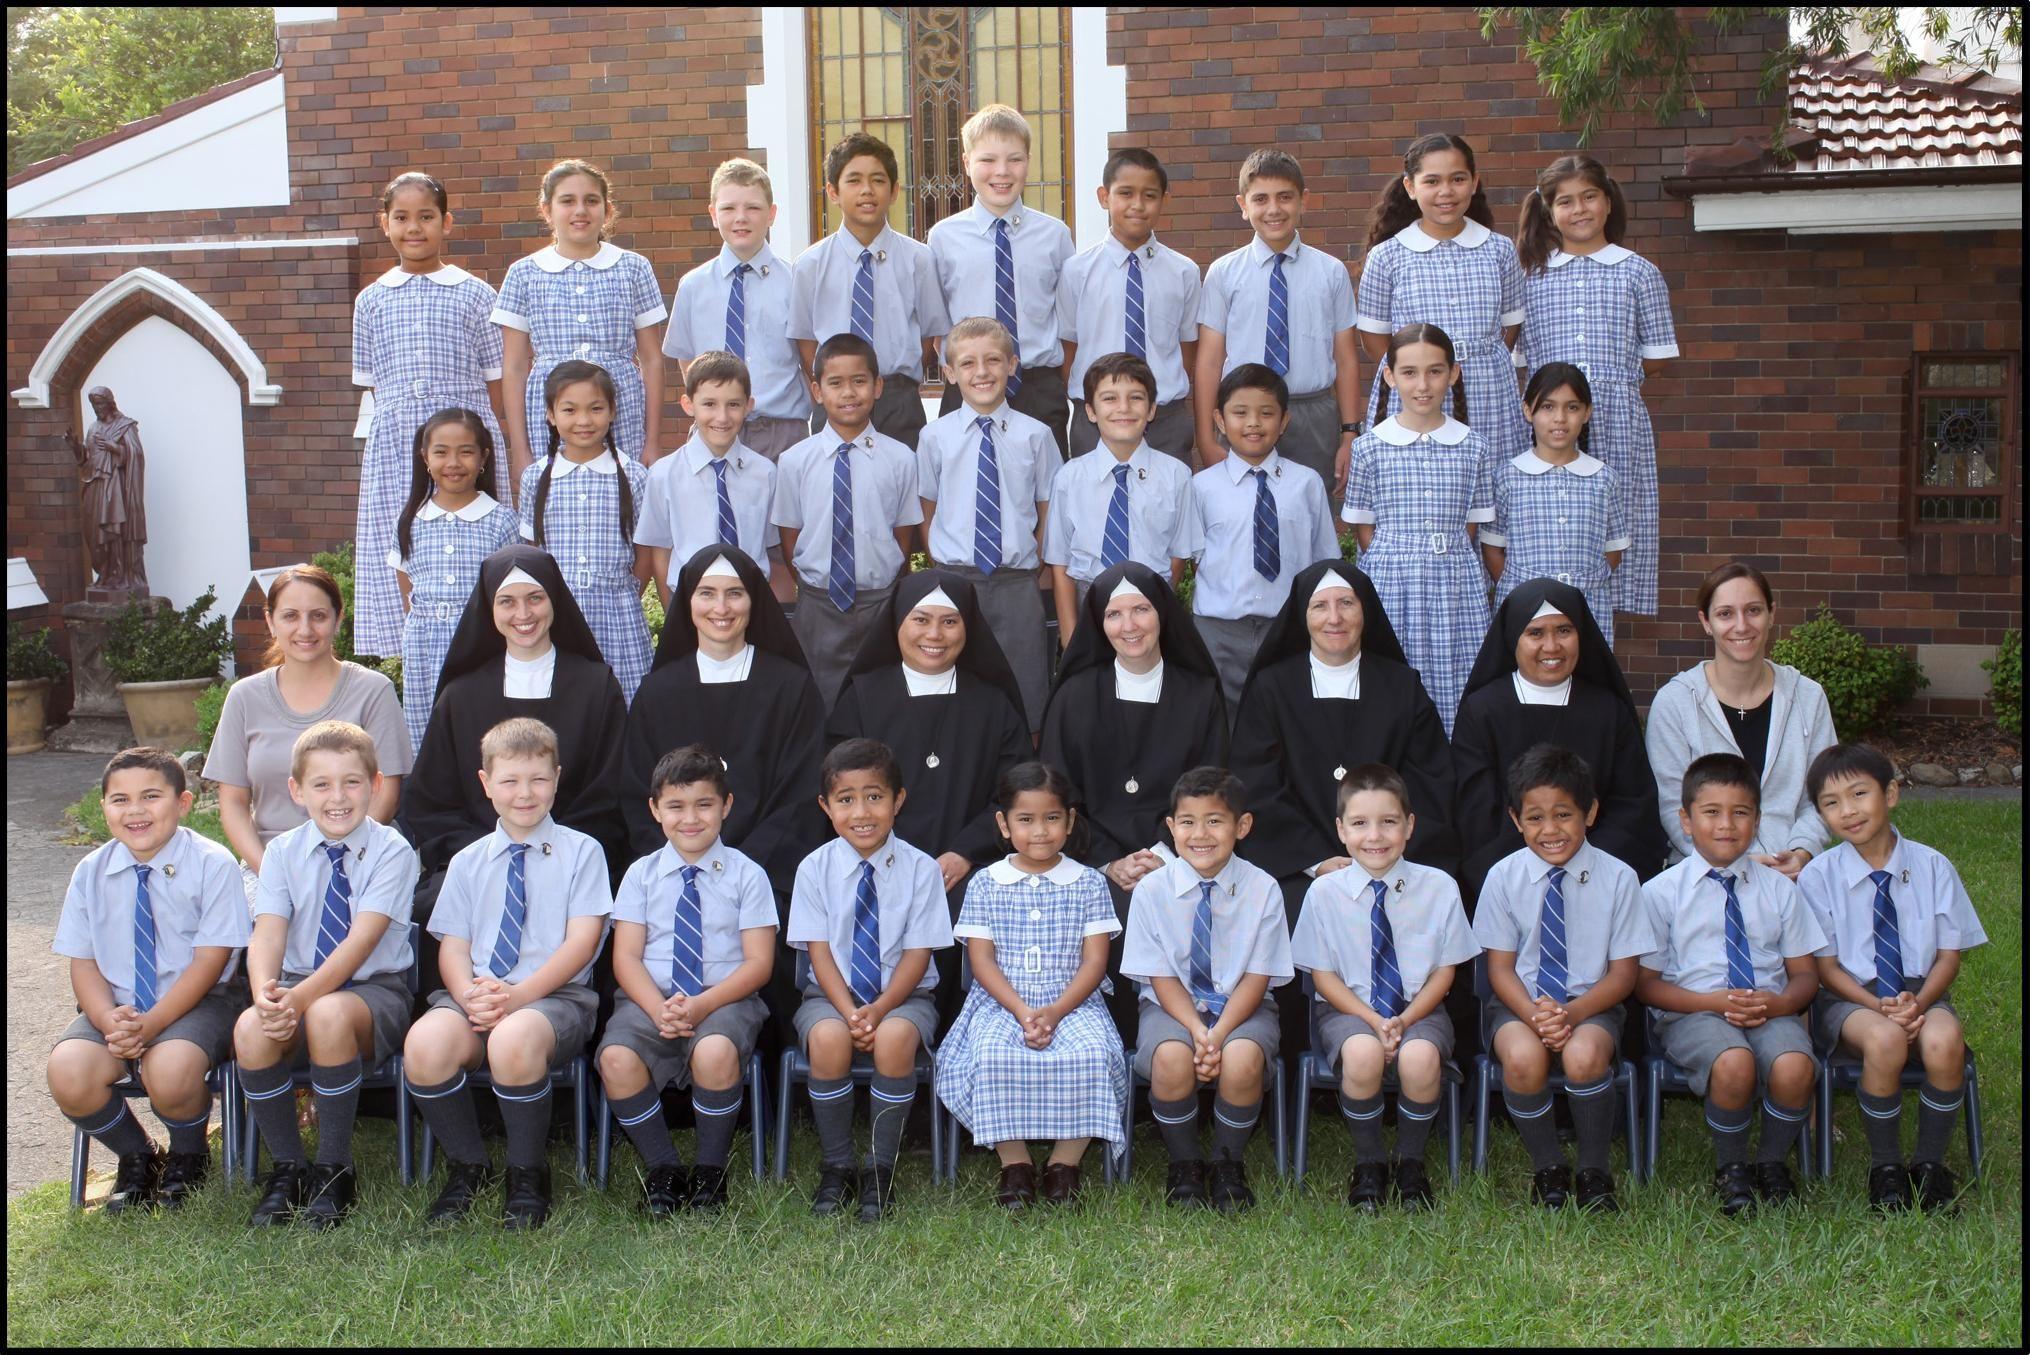 St Dominic Savio School is a Catholic School open to boys